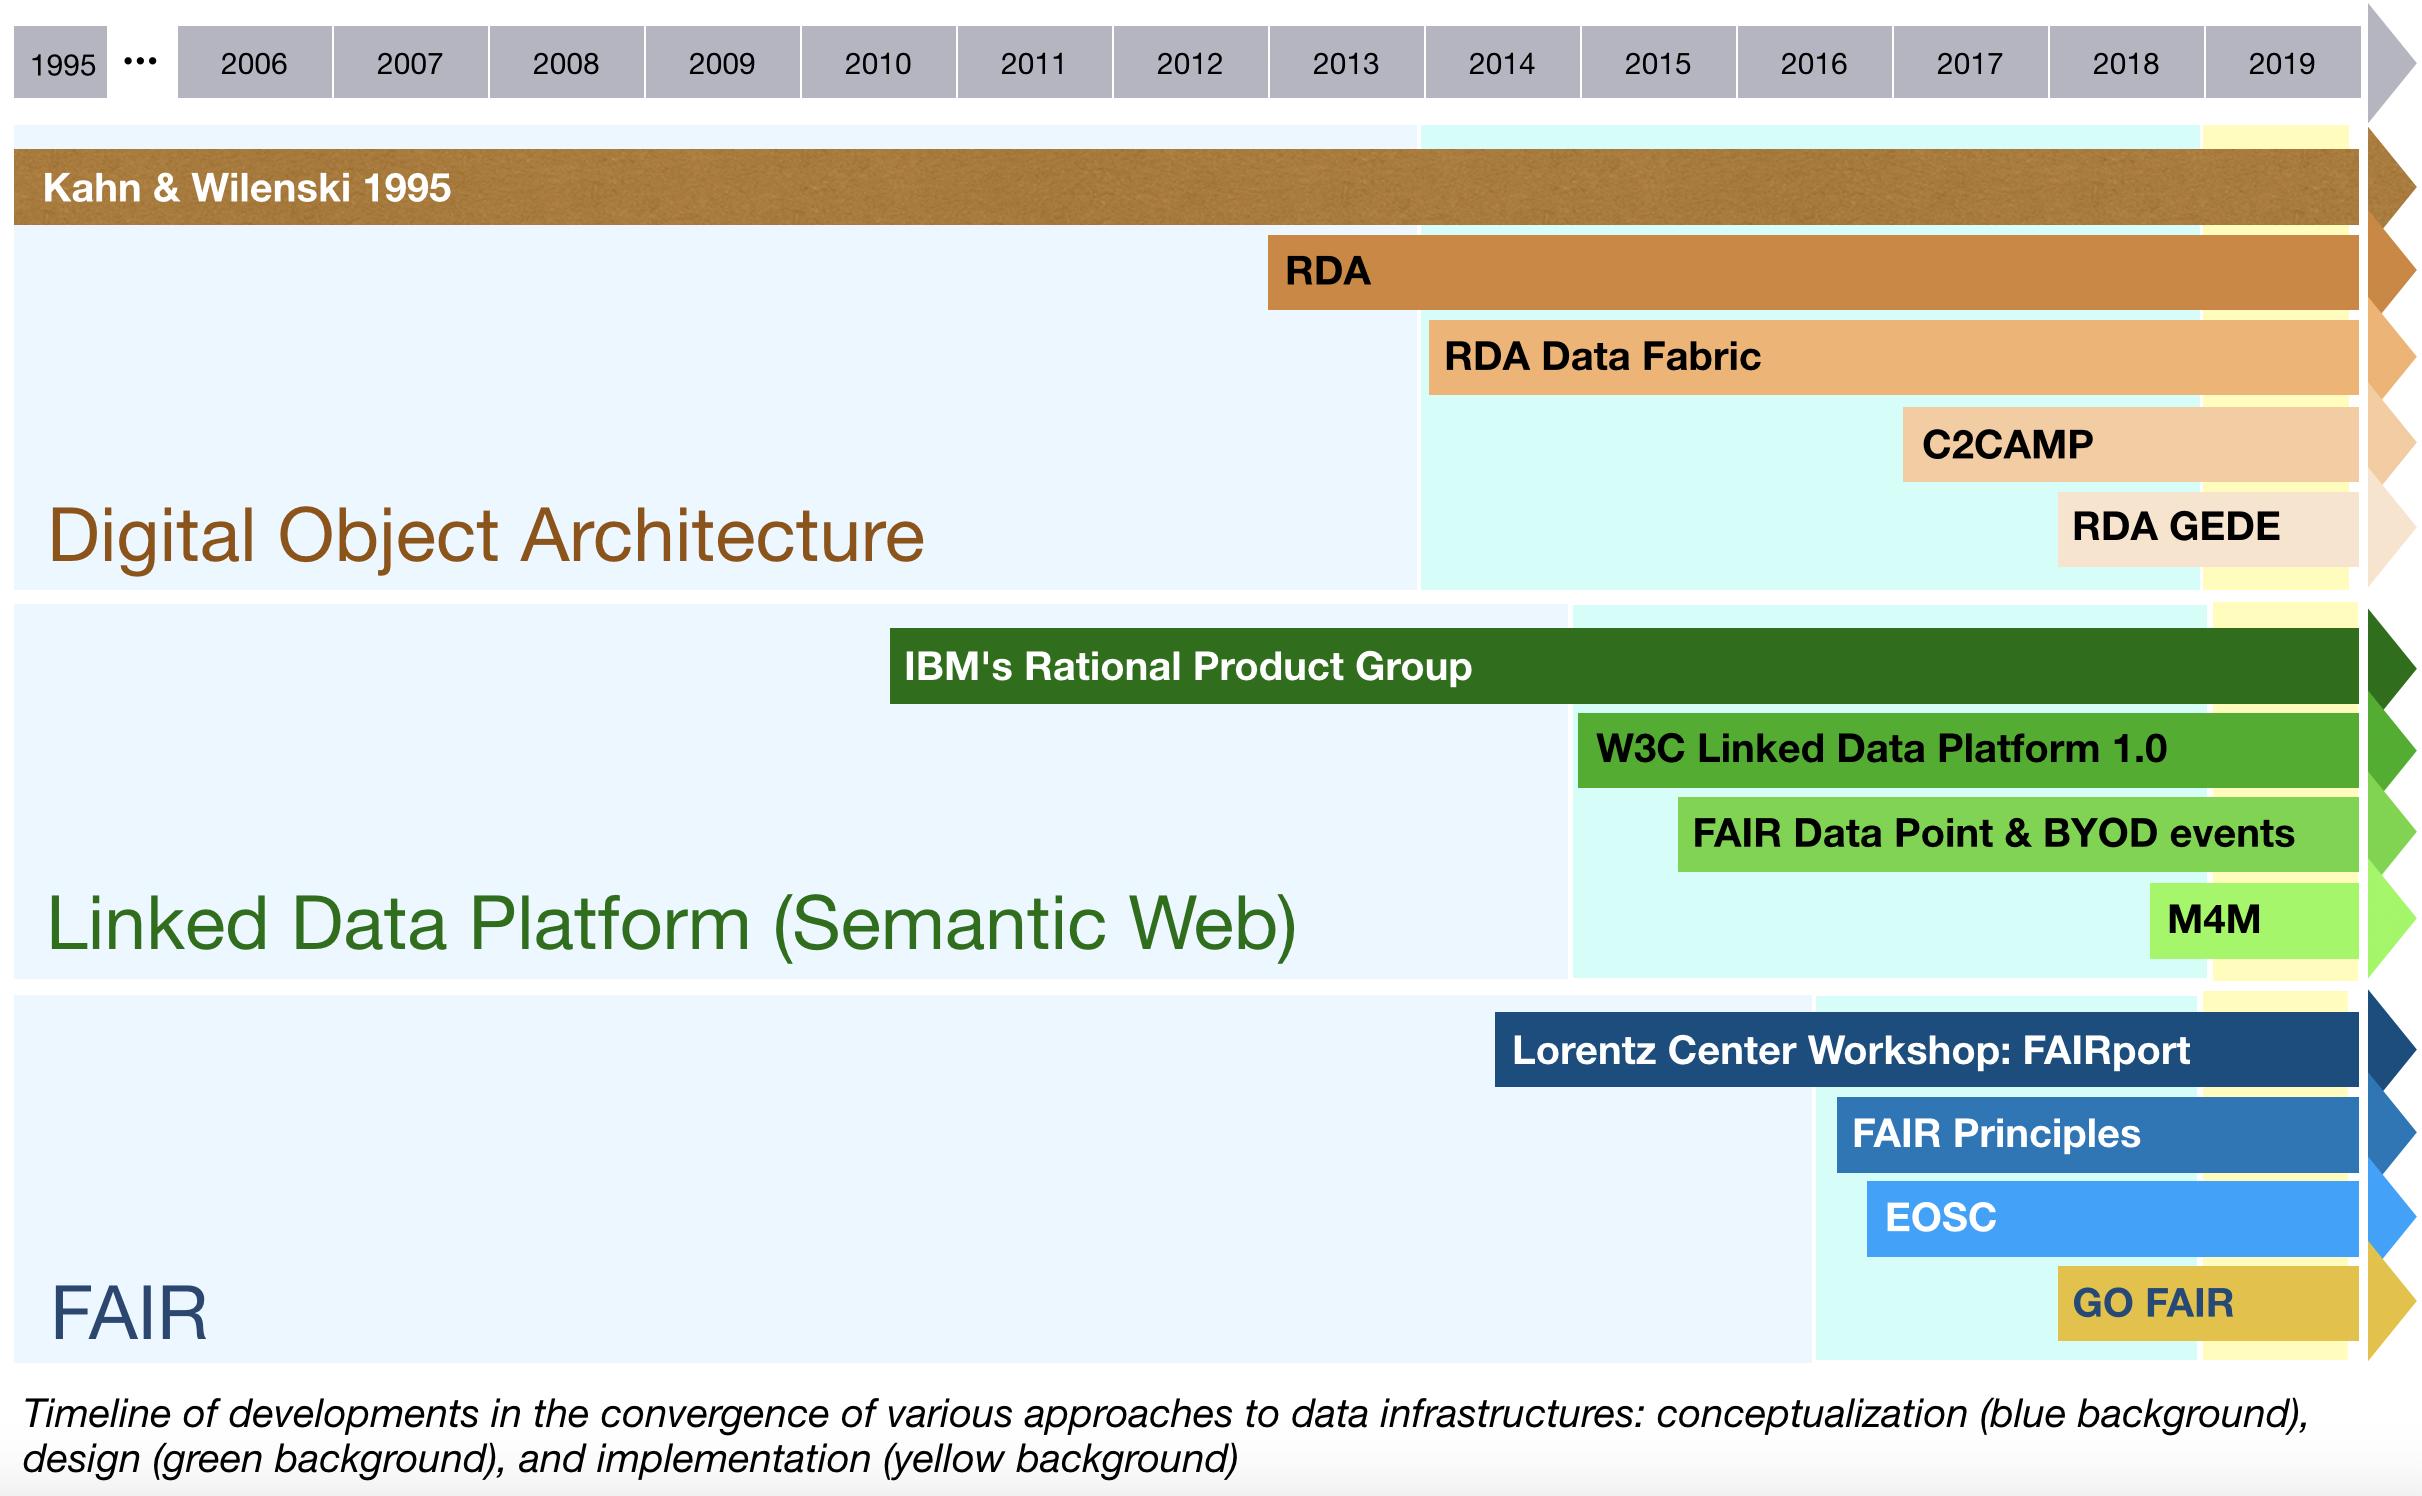 convergence developments timeline